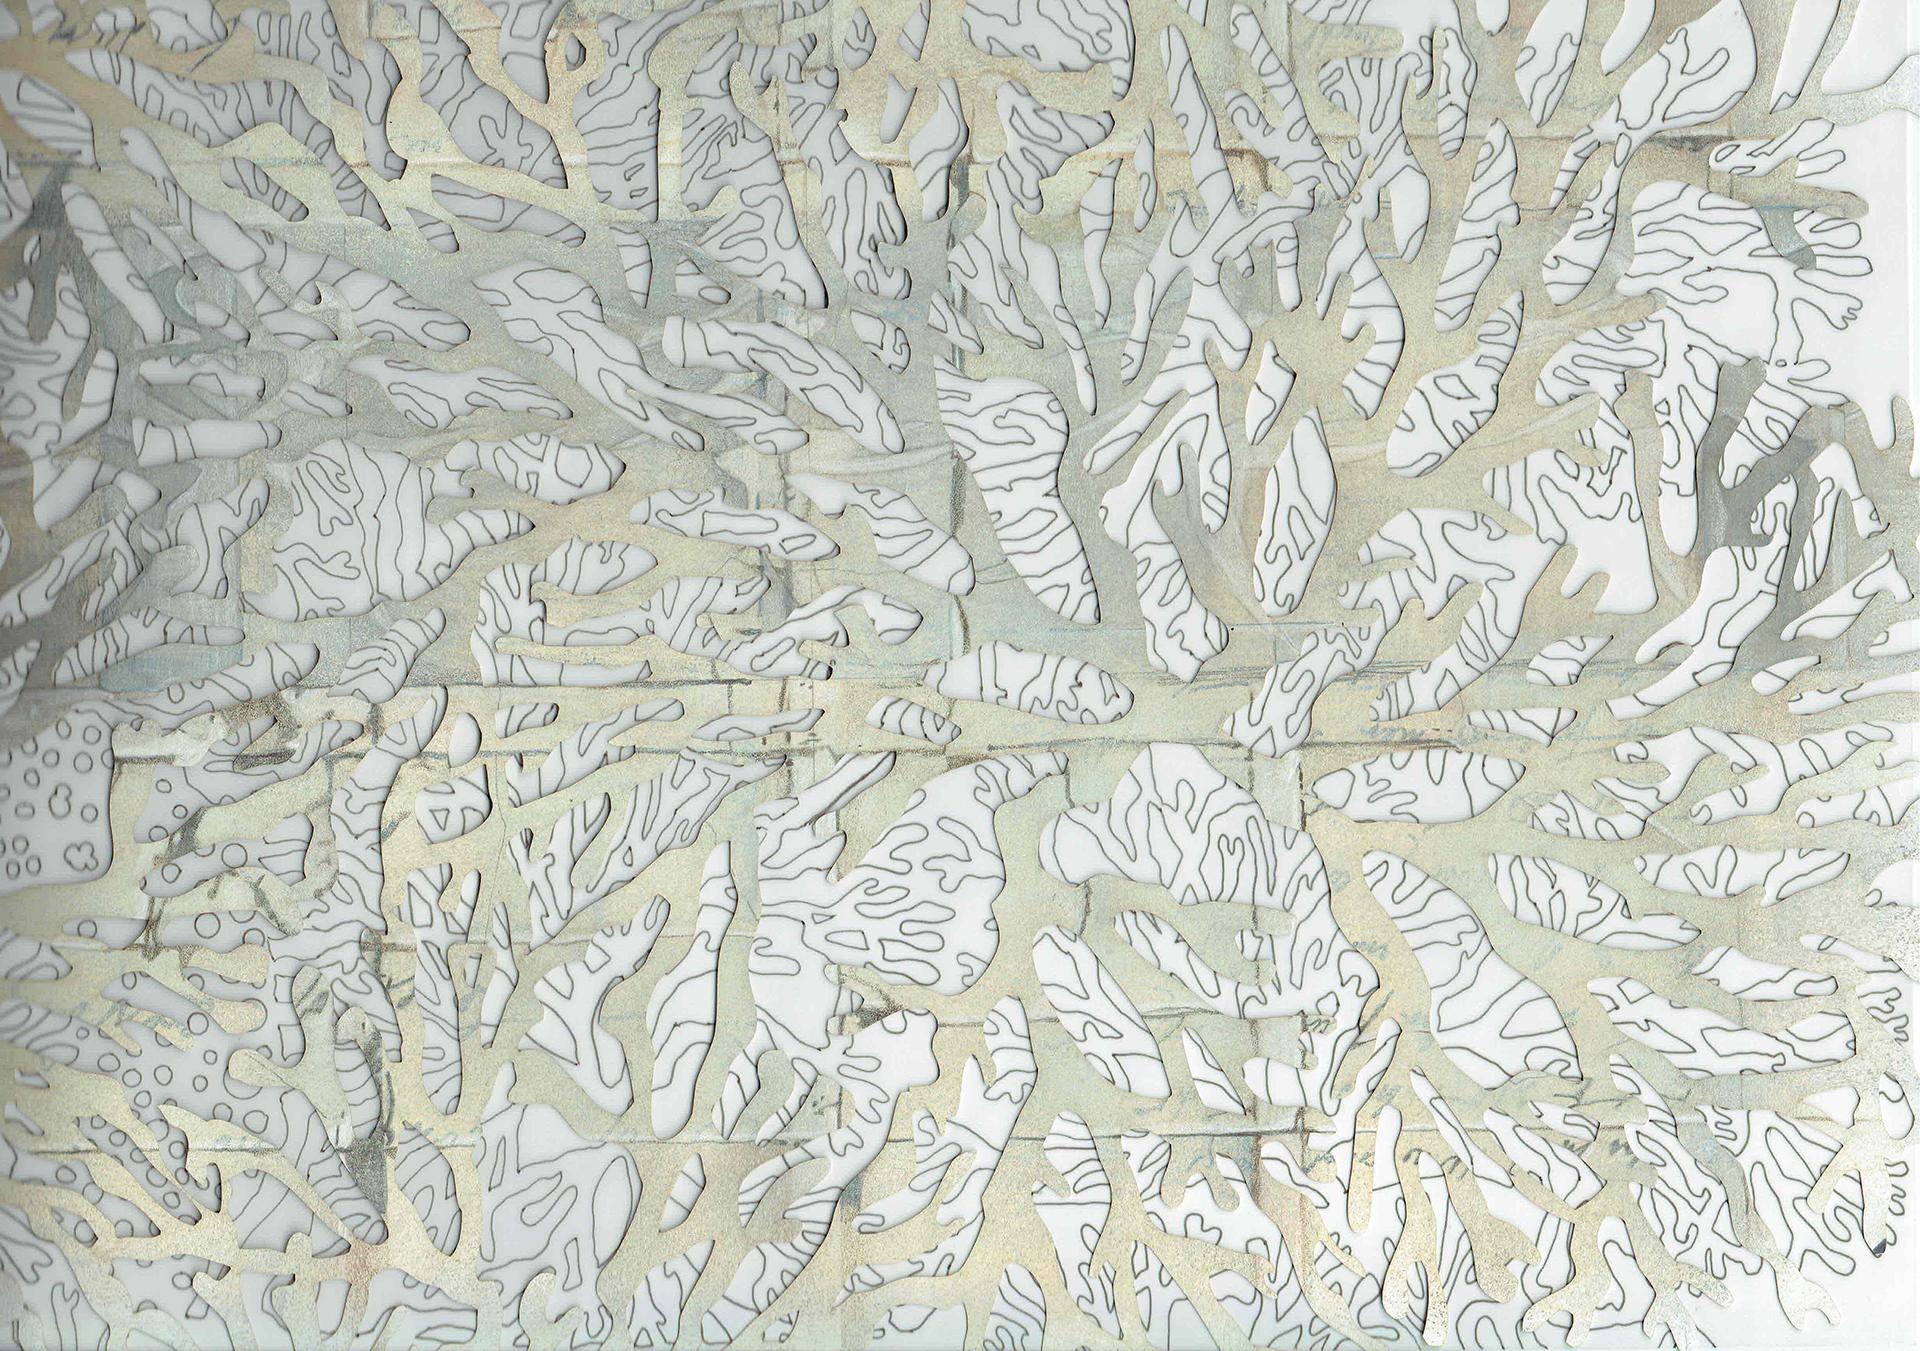 Emma Robertson - Seaweed Series